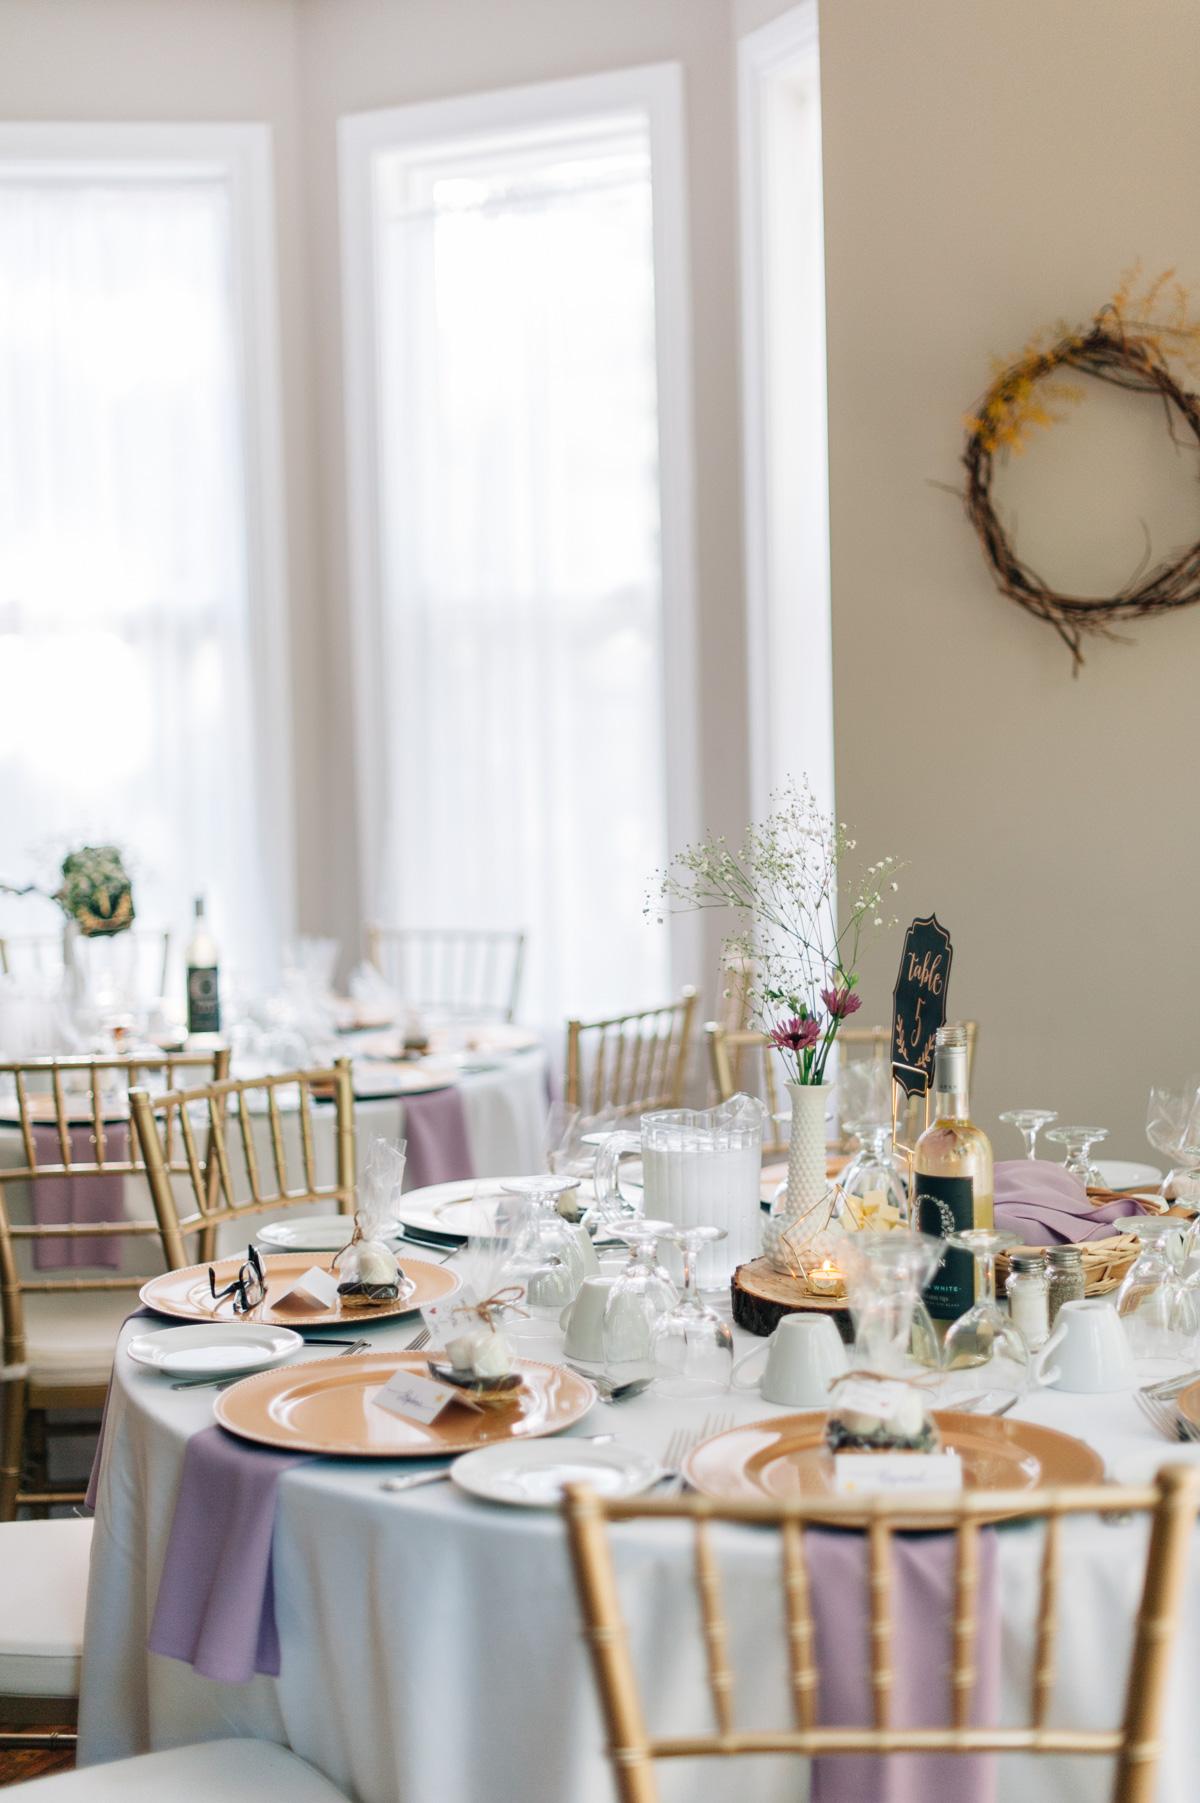 sara-wilde-photography-vineyard-bride-swish-list-beamer-falls-manor-grimsby-wedding-75.jpg